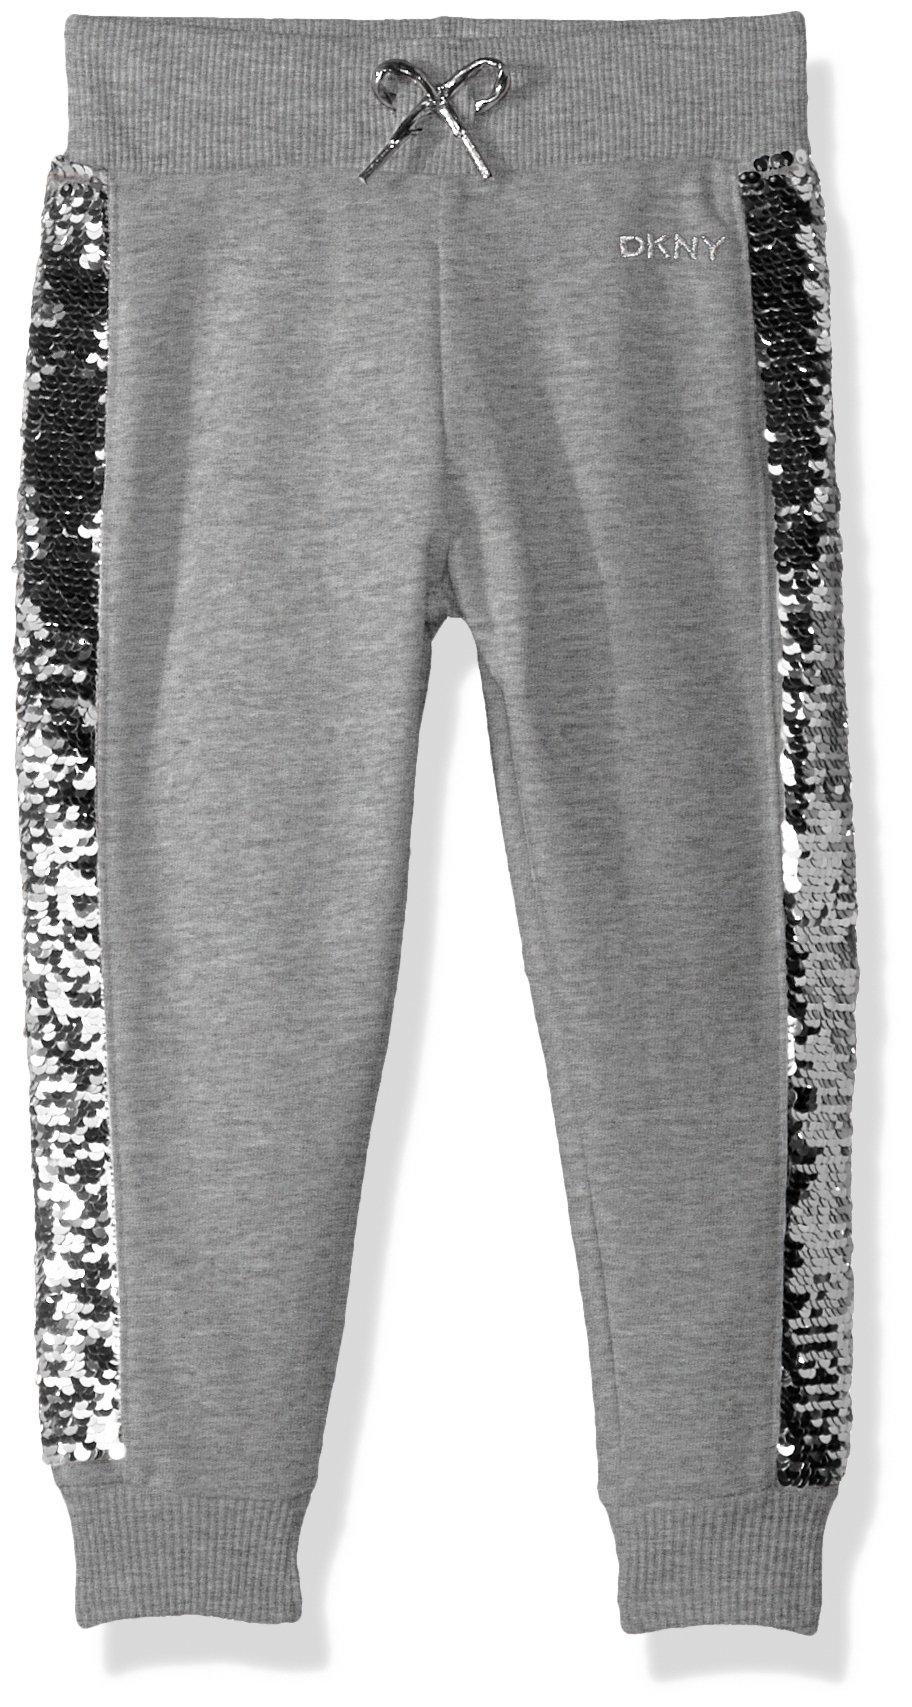 DKNY Big Girls' Casual Pant, Flip Sequin Light Heather, 8/10